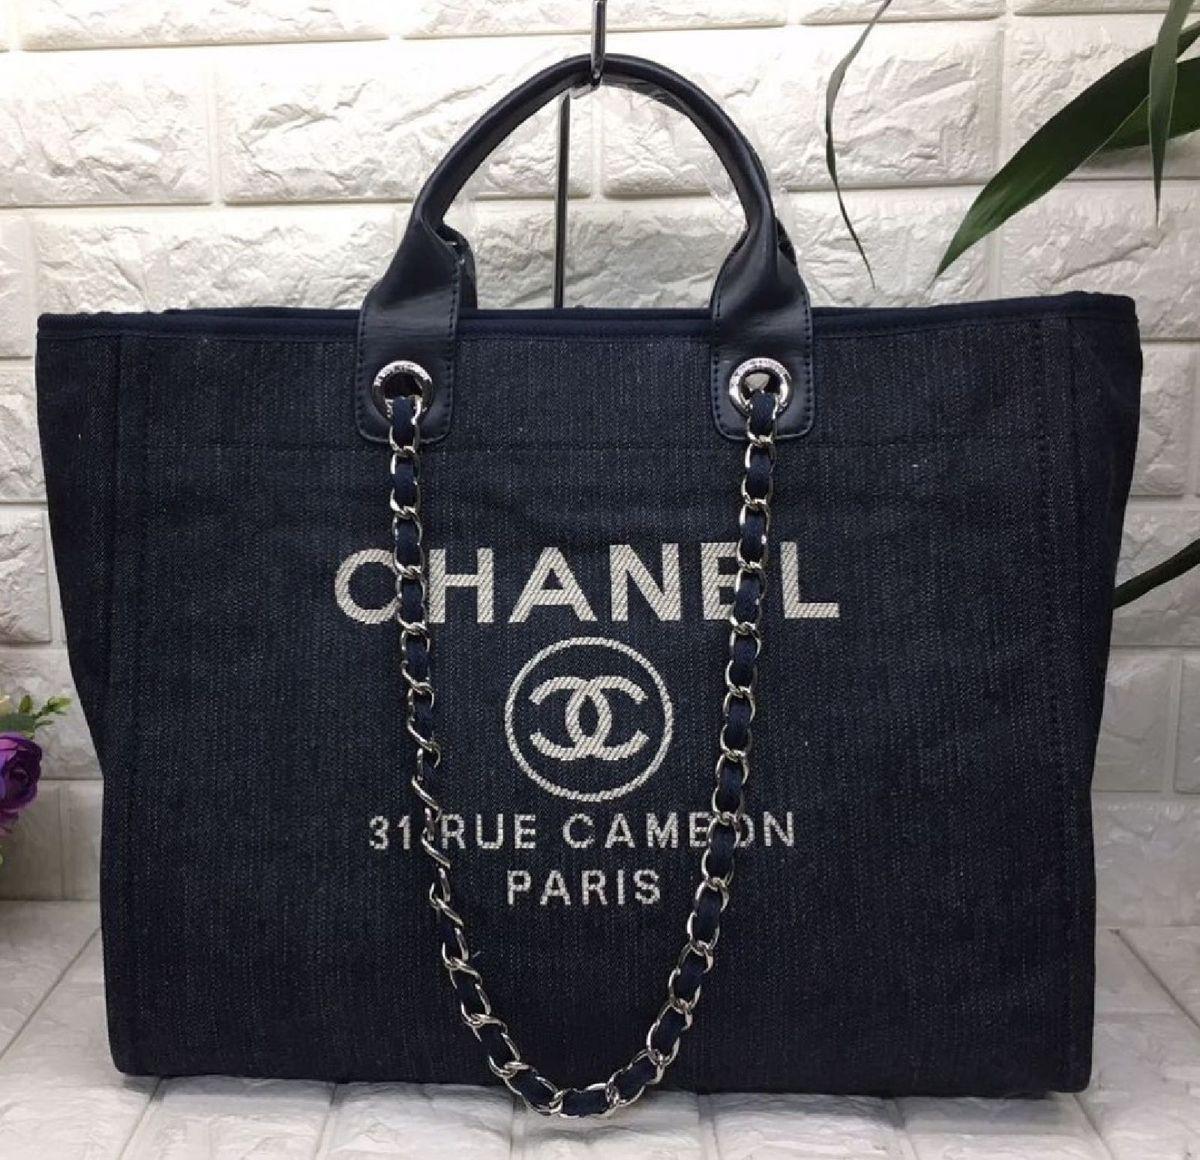 063f4617c89455 bolsa chanel deauville tote canvas azul pronta entrega - bolsas chanel